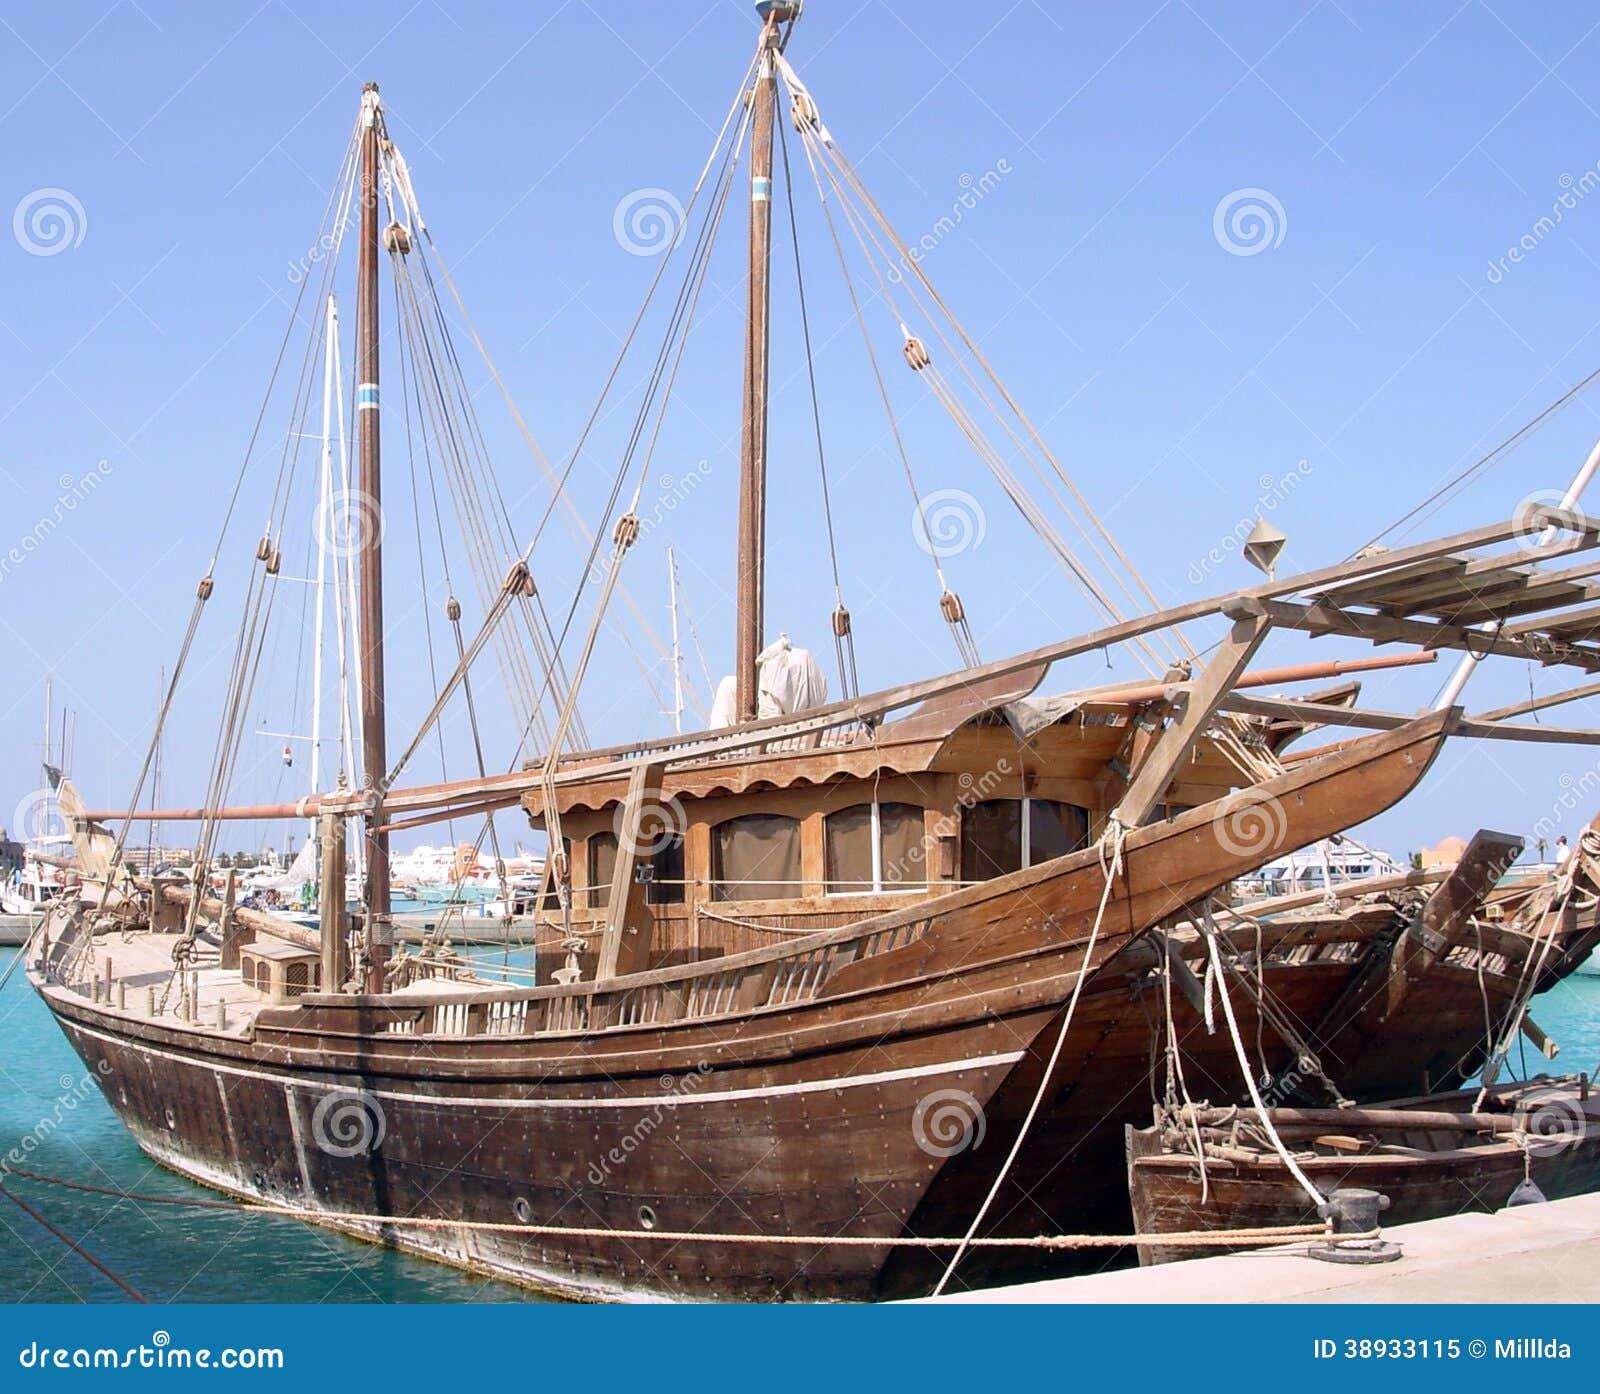 Old Wooden Sailing Ship Stock Image Image Of Vintage 38933115